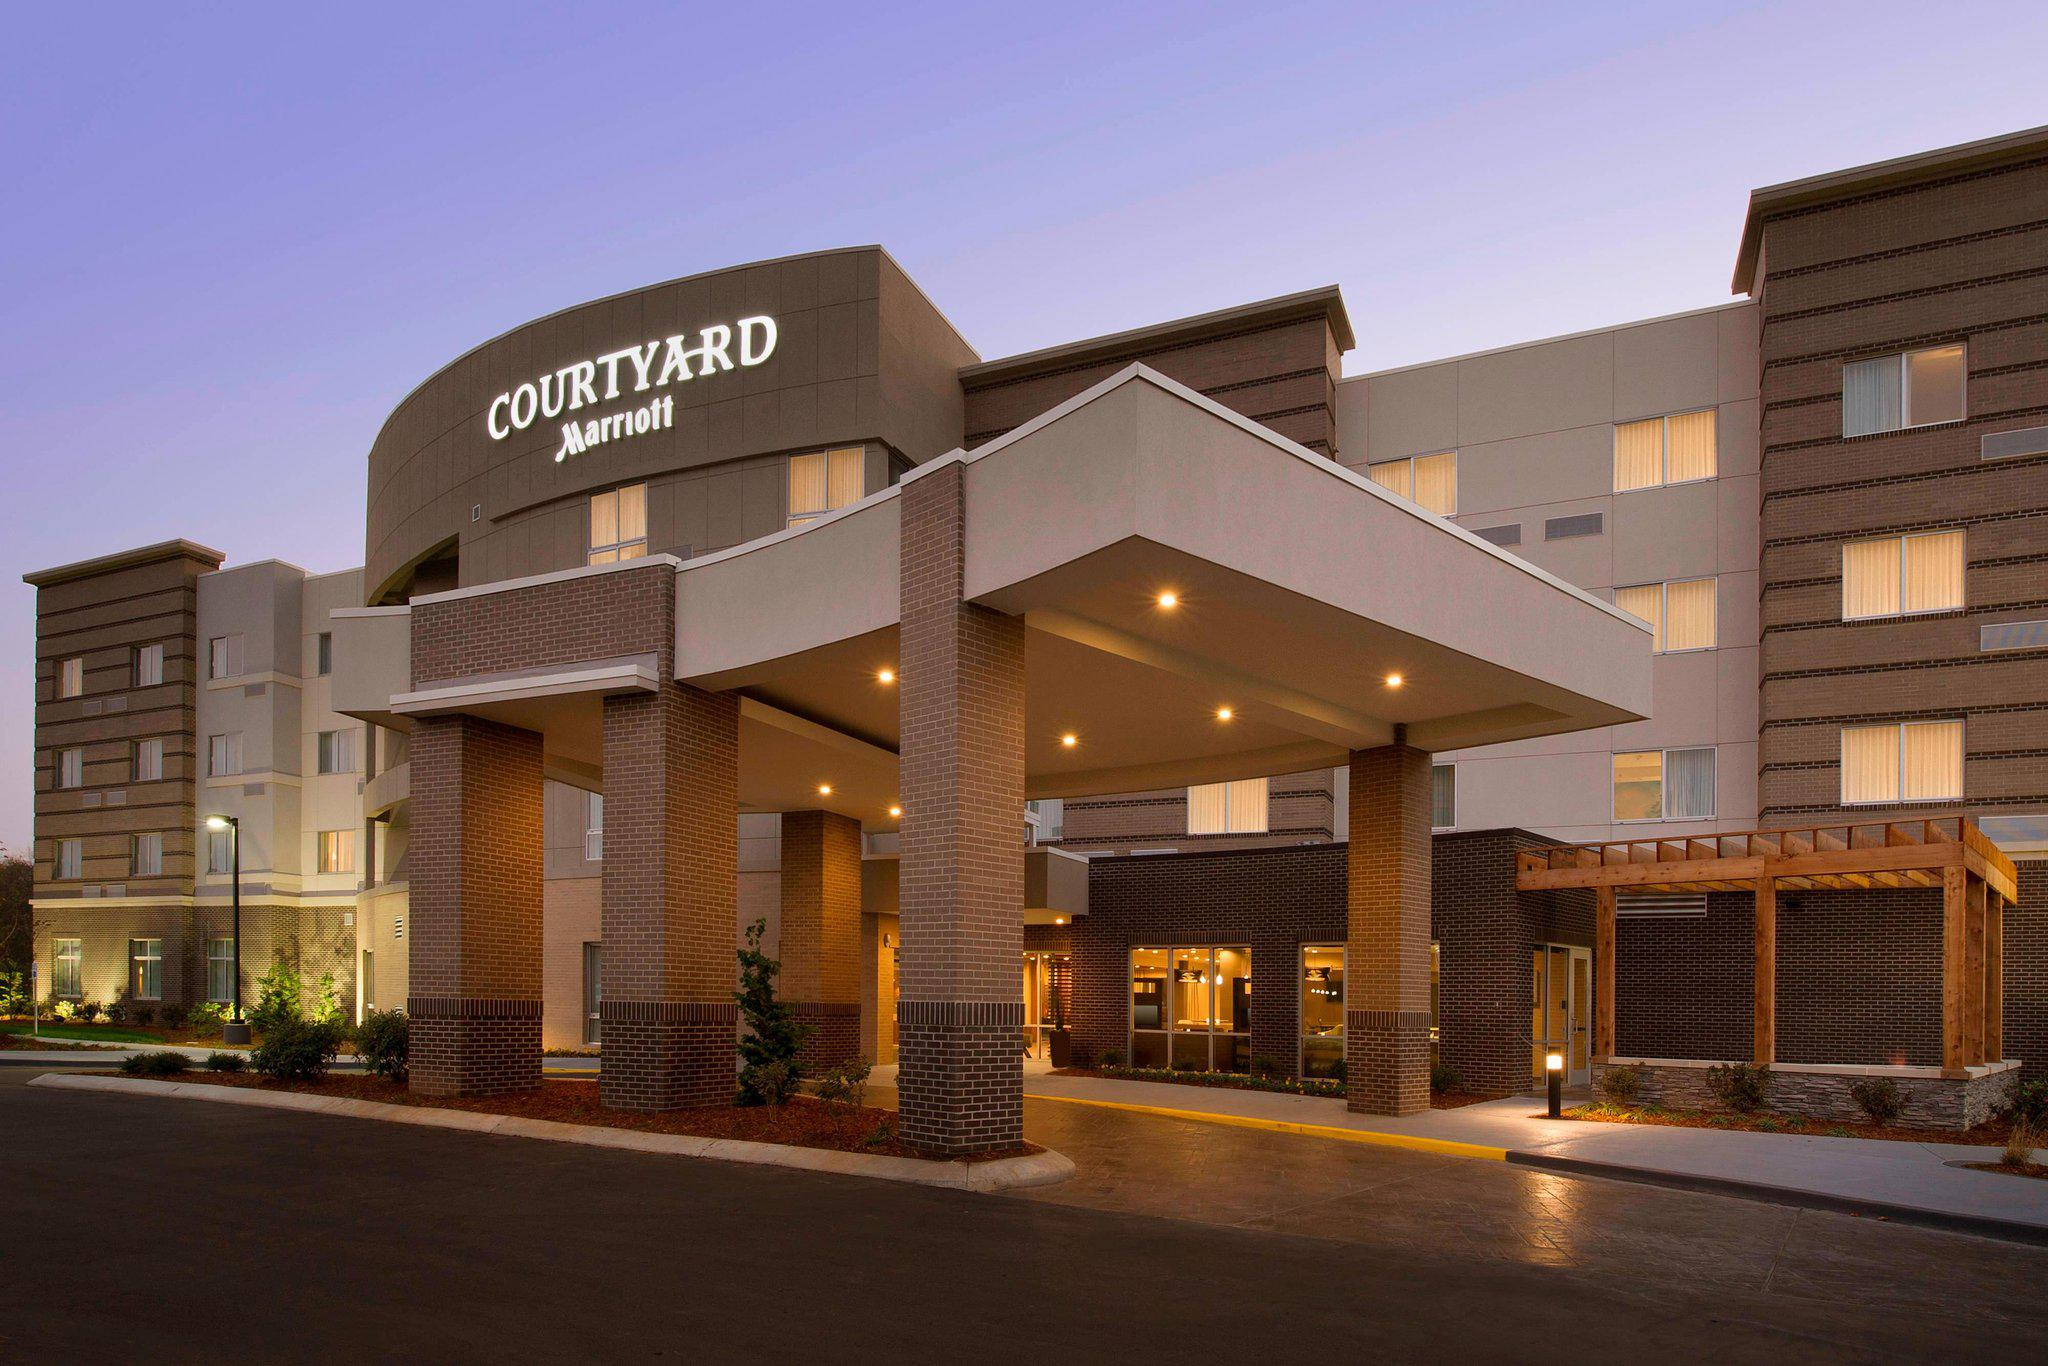 Courtyard by Marriott Nashville SE/Murfreesboro